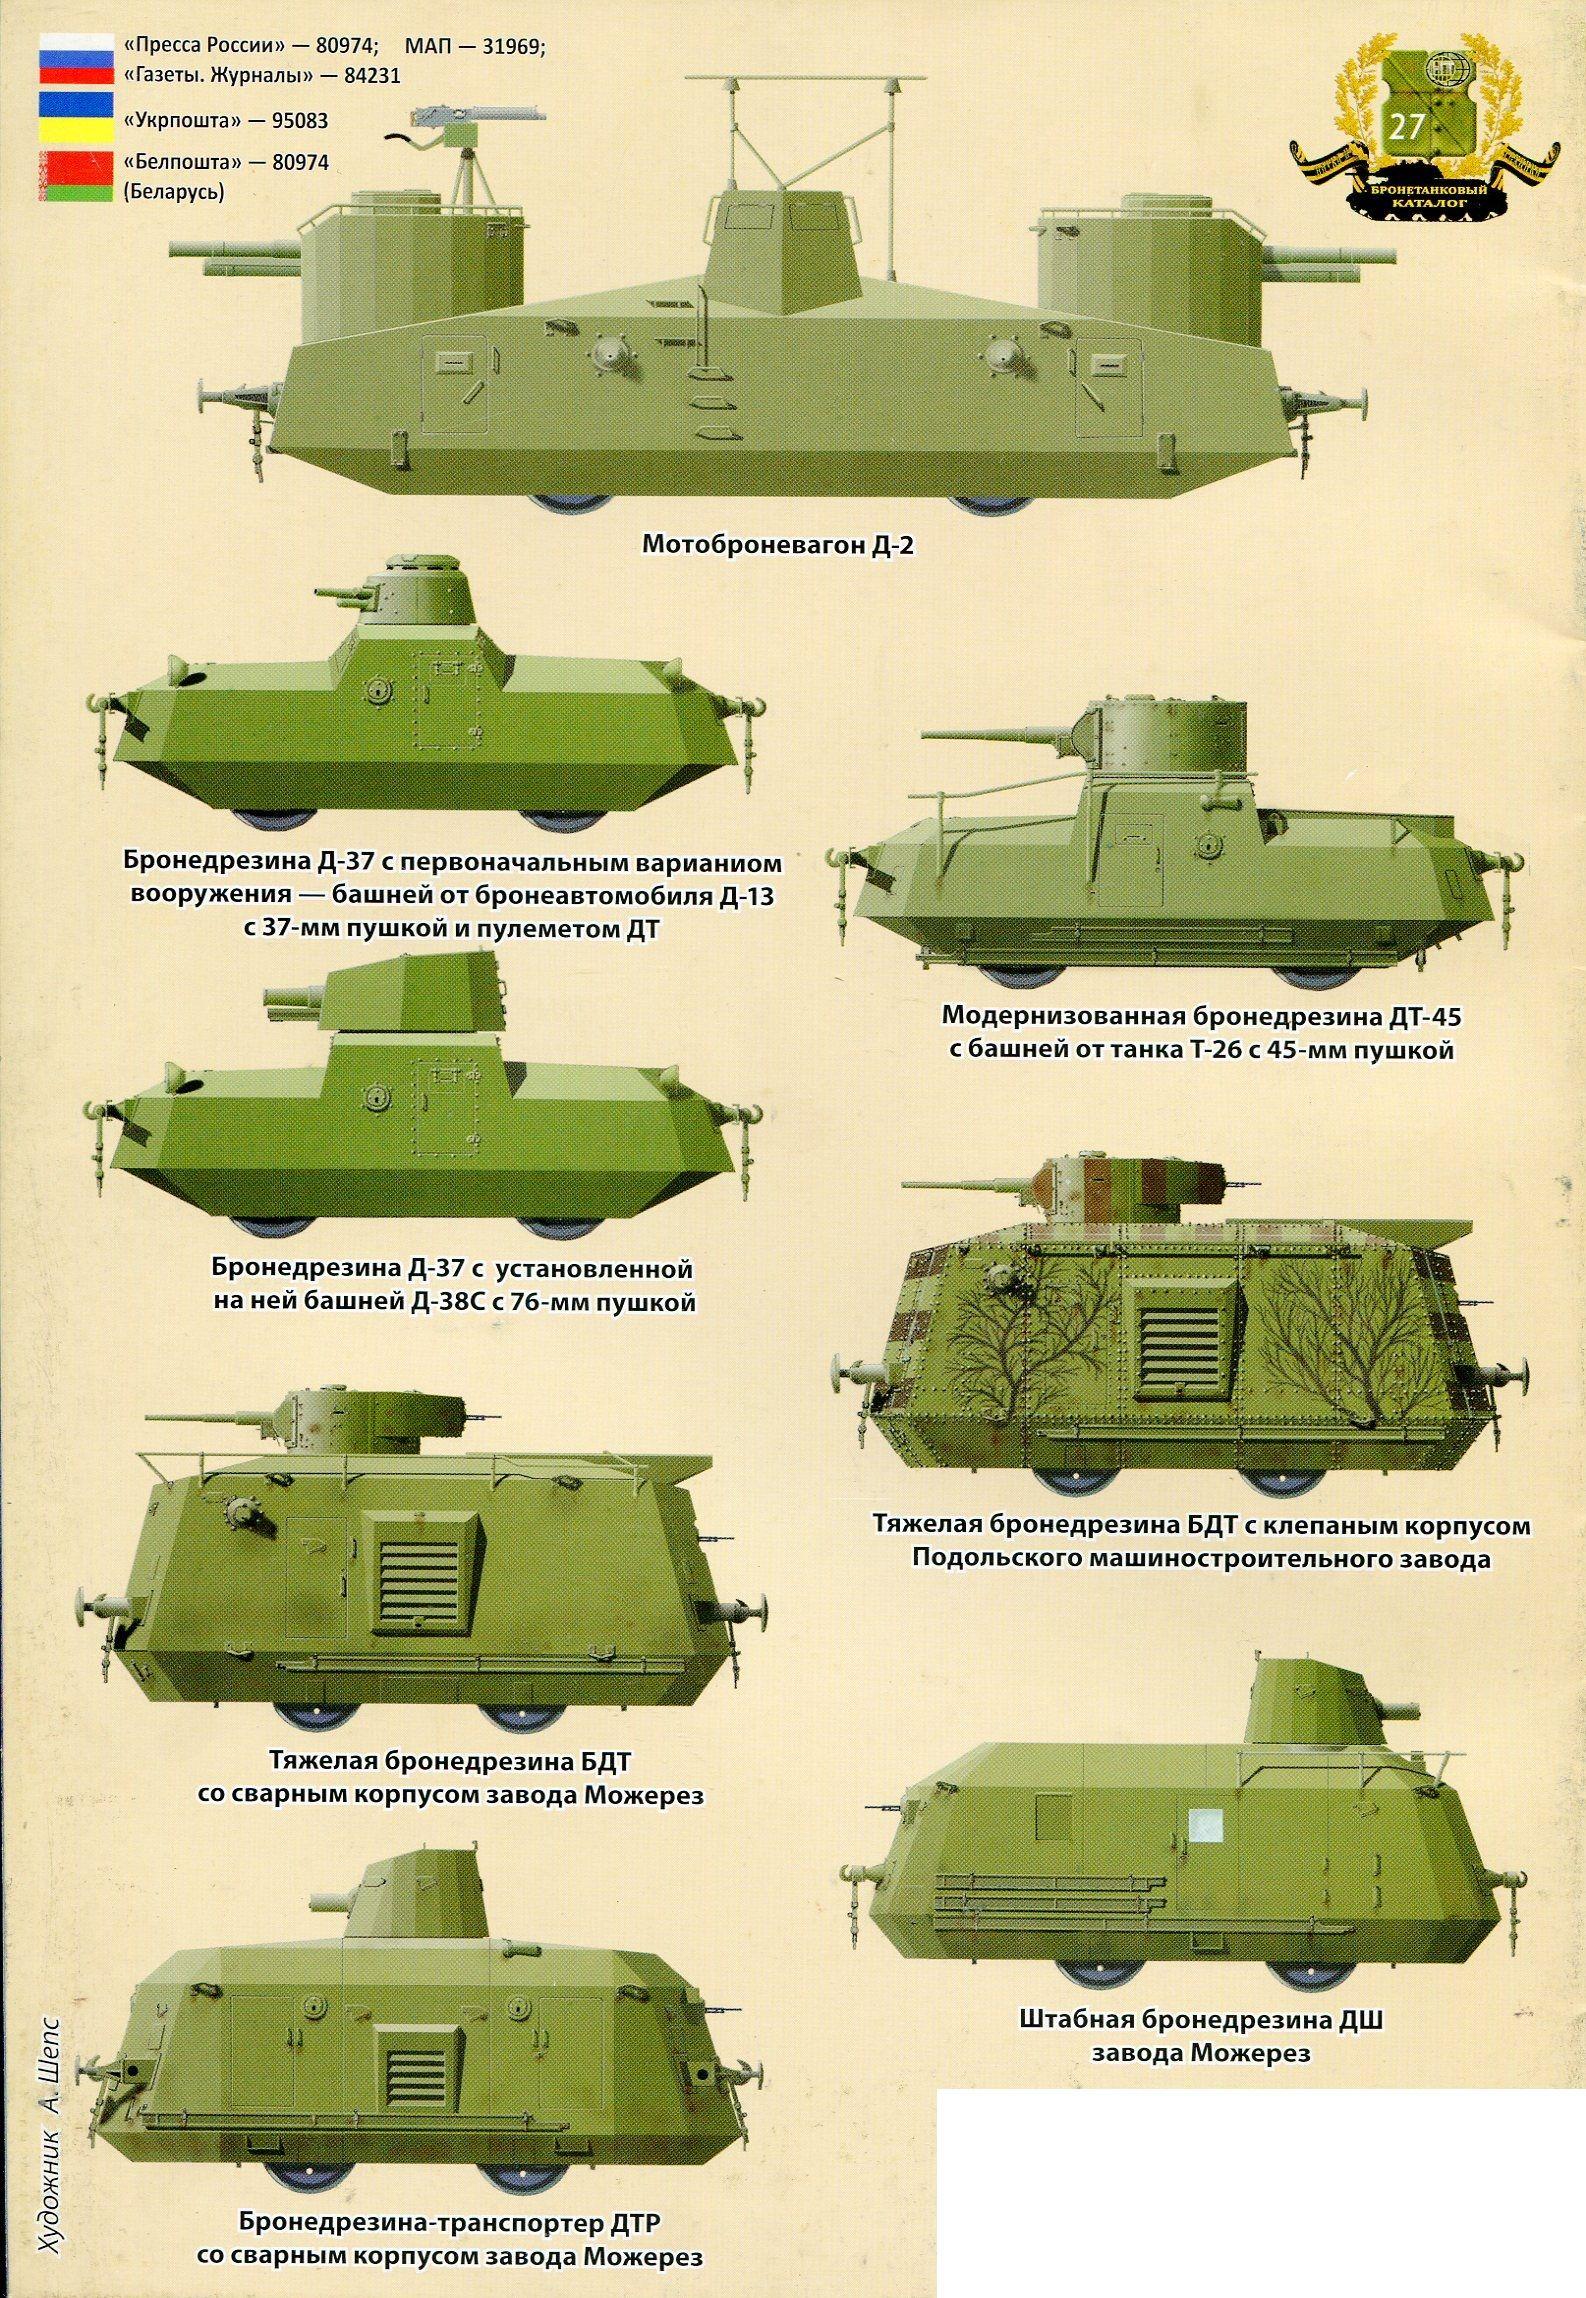 бронедрезина транспортер